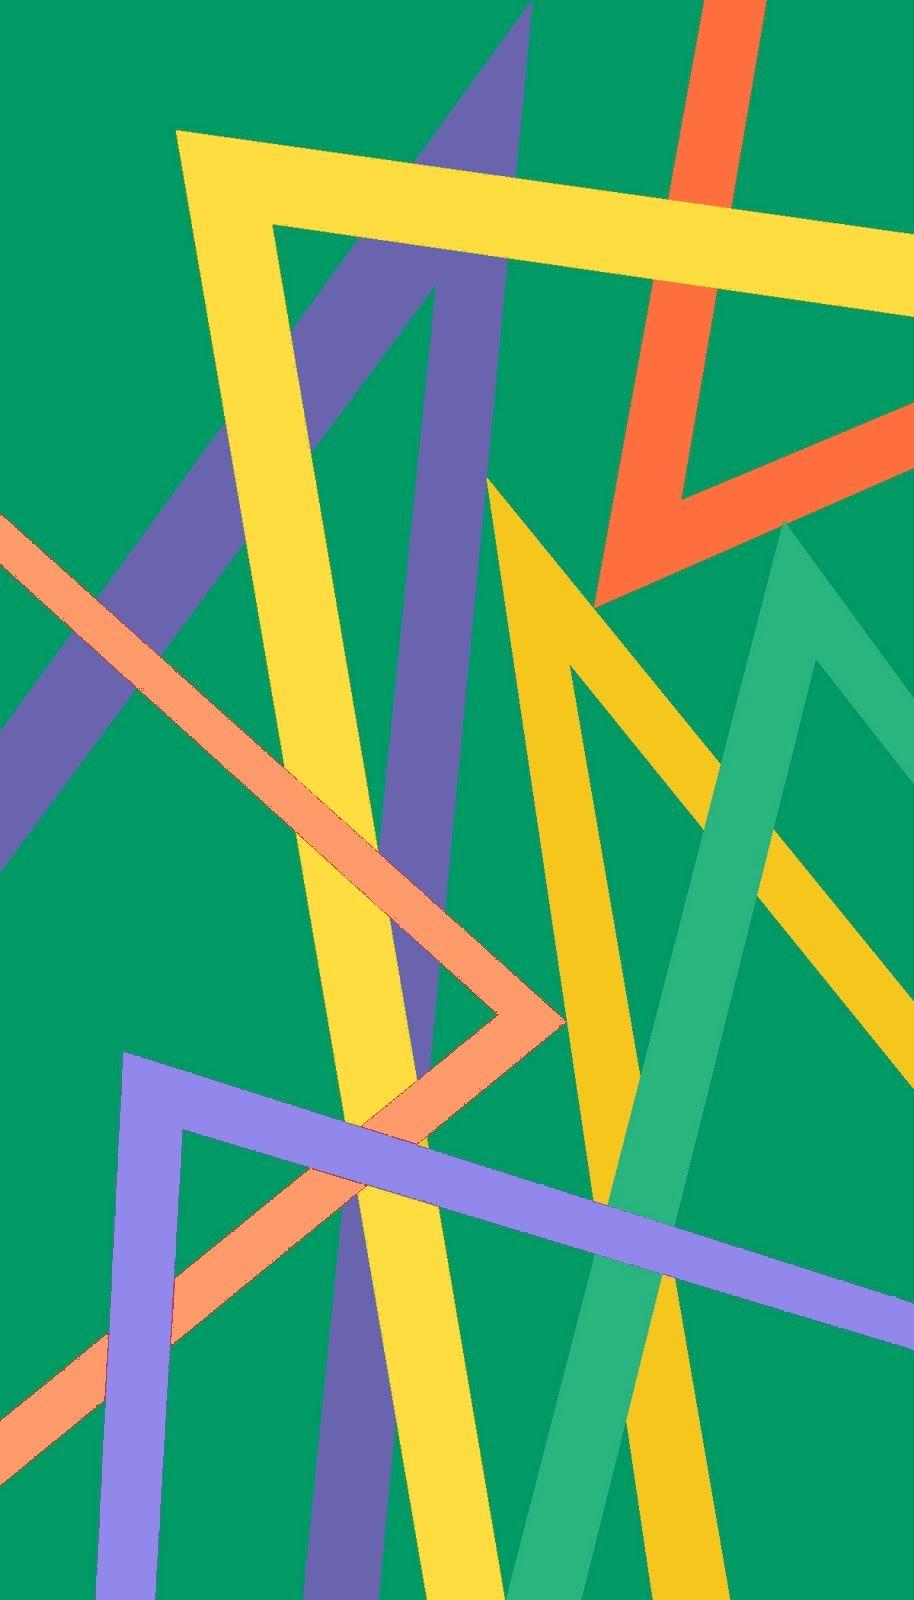 Graphic Design Double Split Complementary Palette Corrected Chelseas Gra Split Complementary Color Scheme Split Complementary Colors Complementary Colors